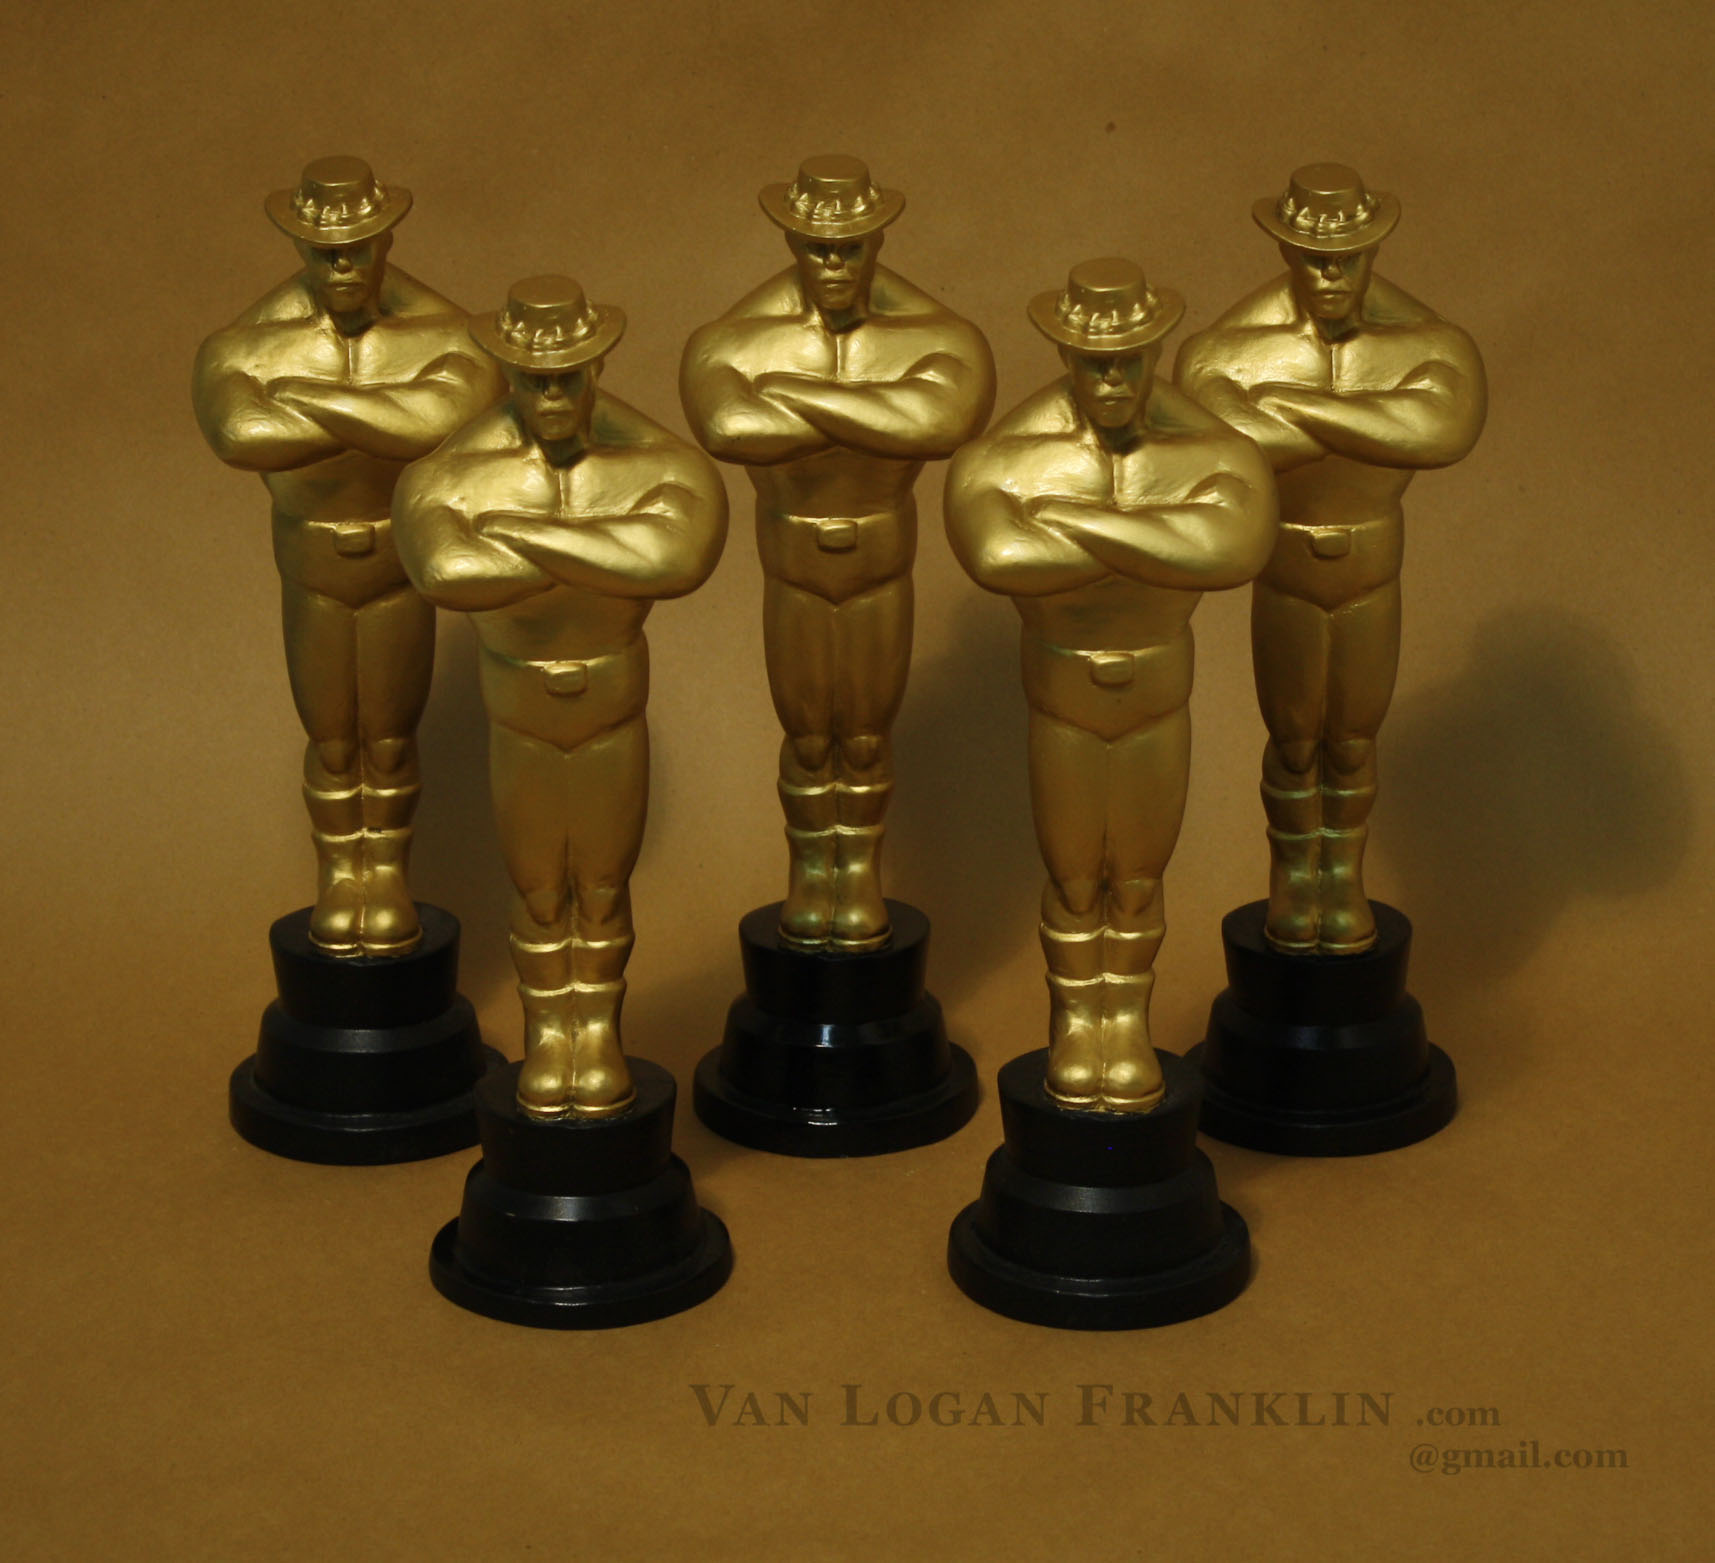 Saxxy Awards by VanLogan